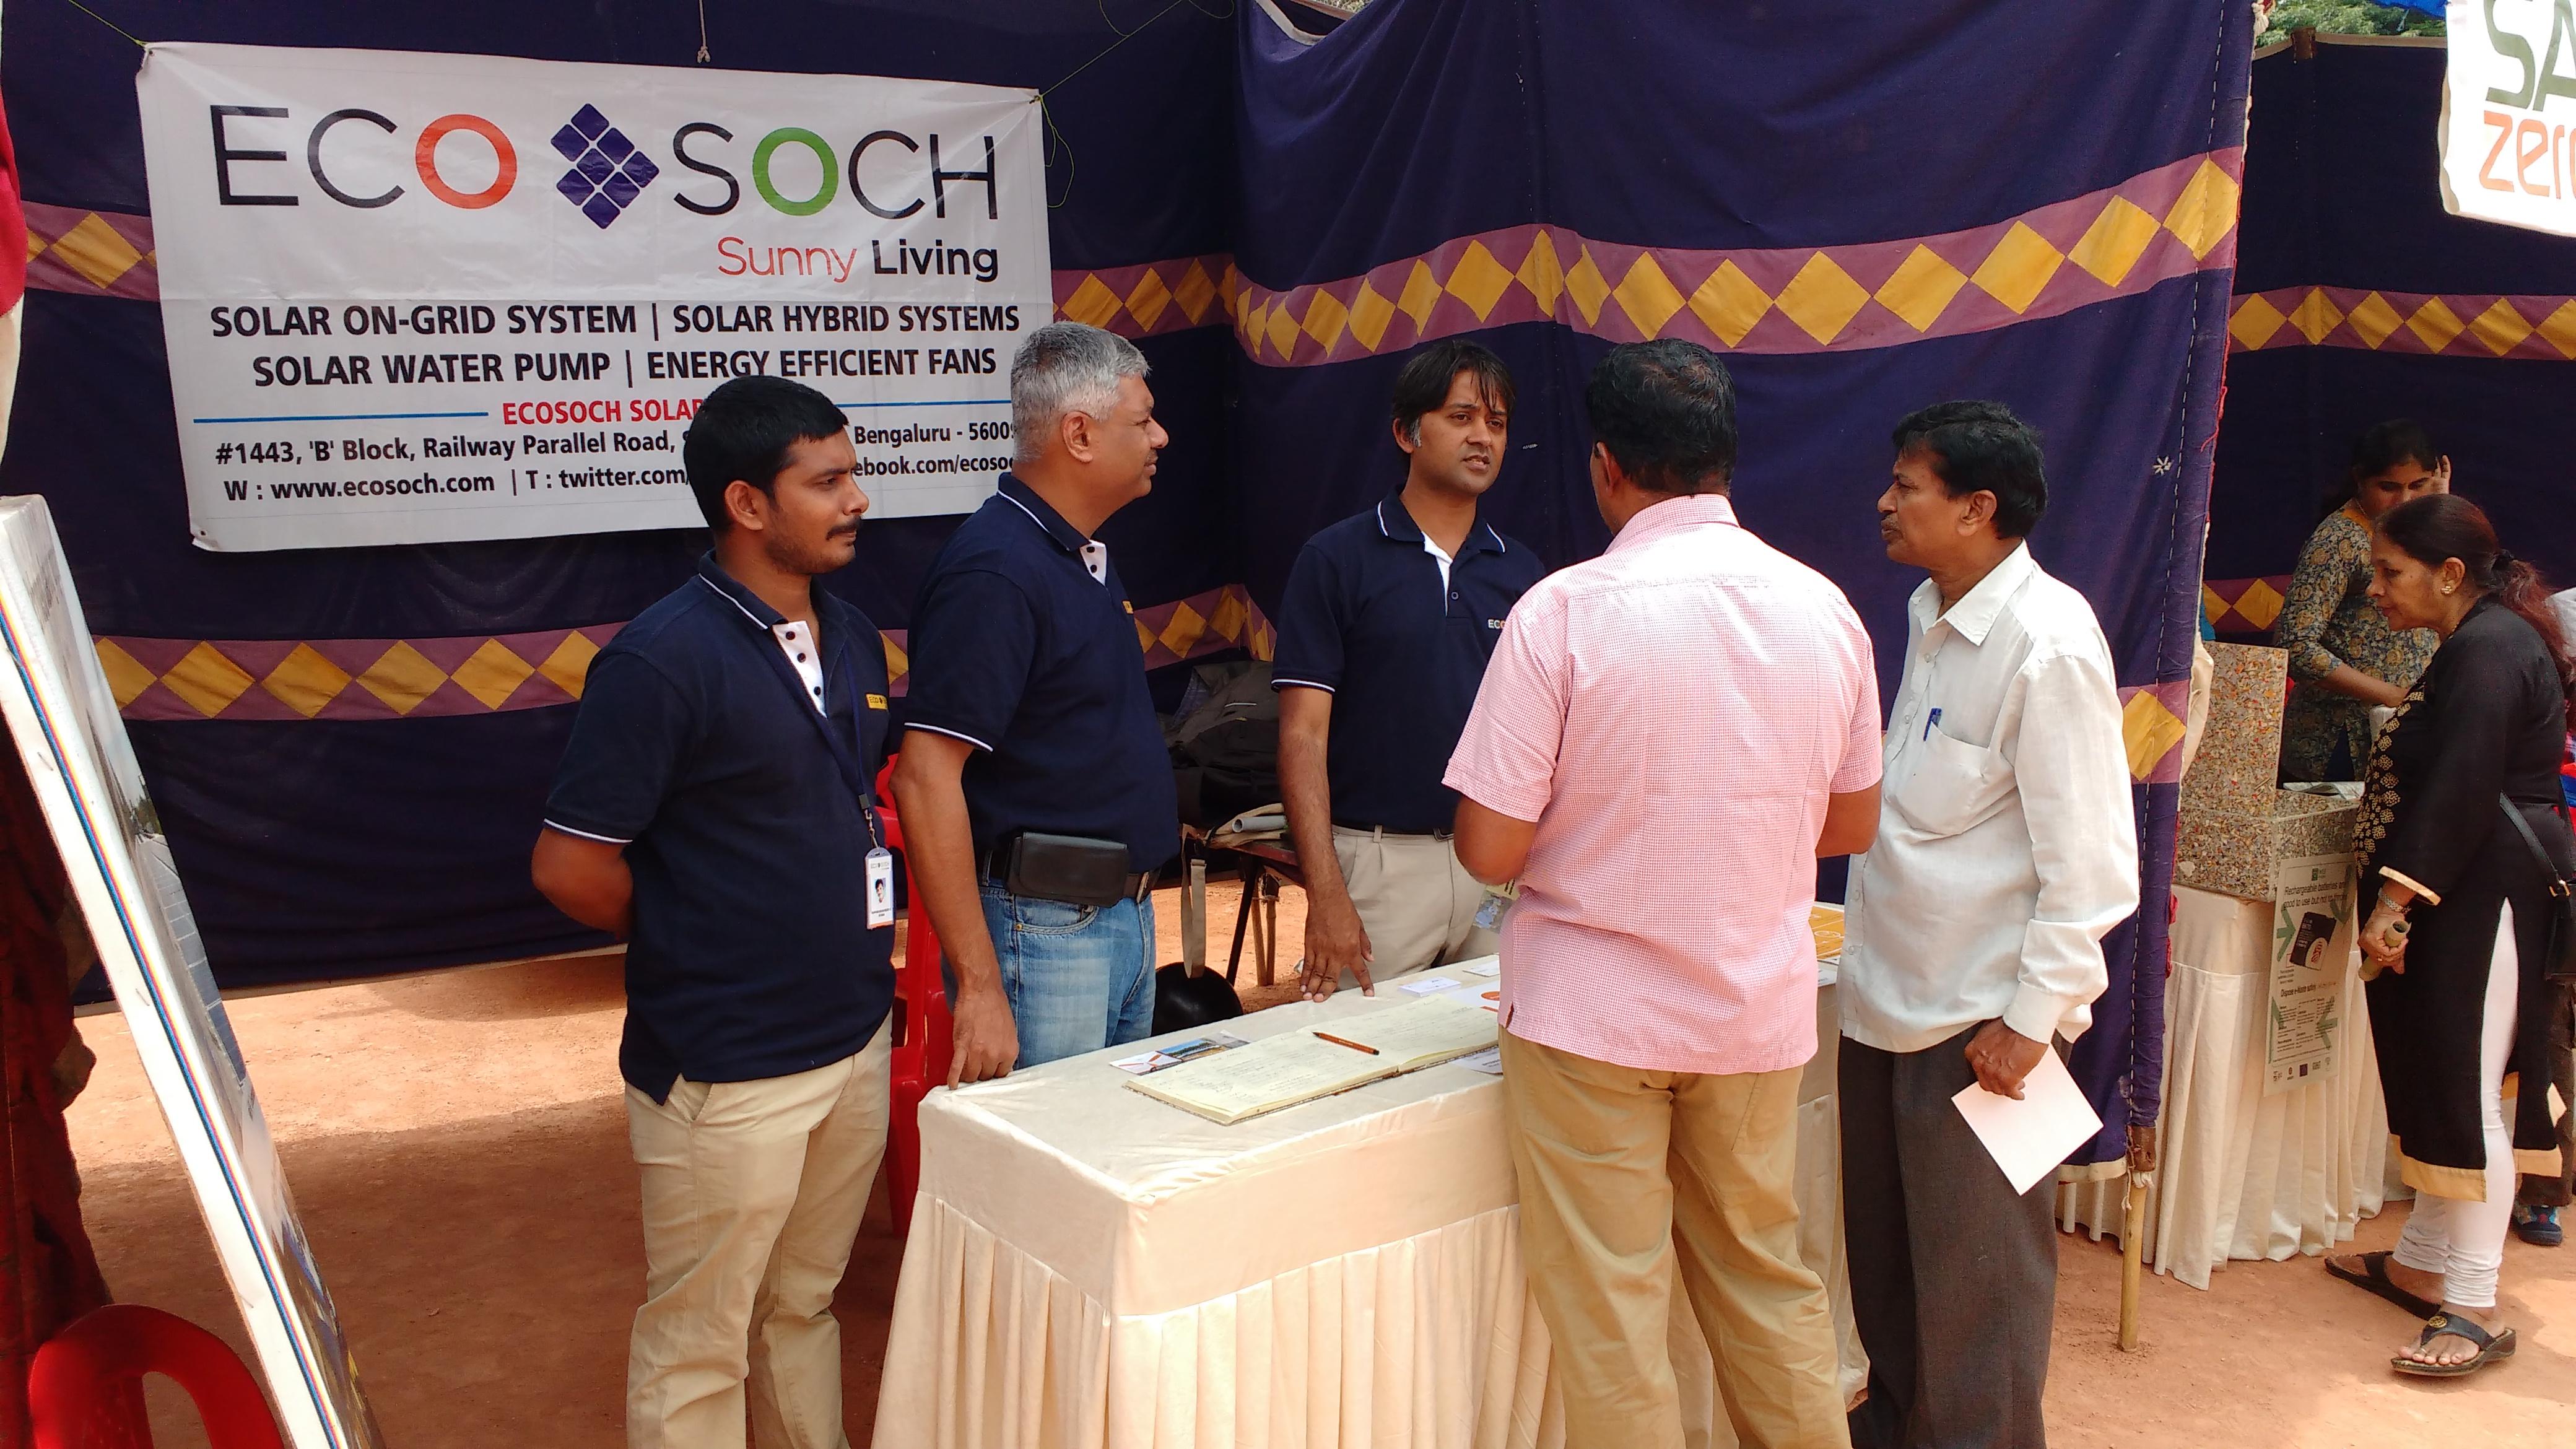 Jal Vayu Vihar Annual Day Celebrations Ecosoch Solar